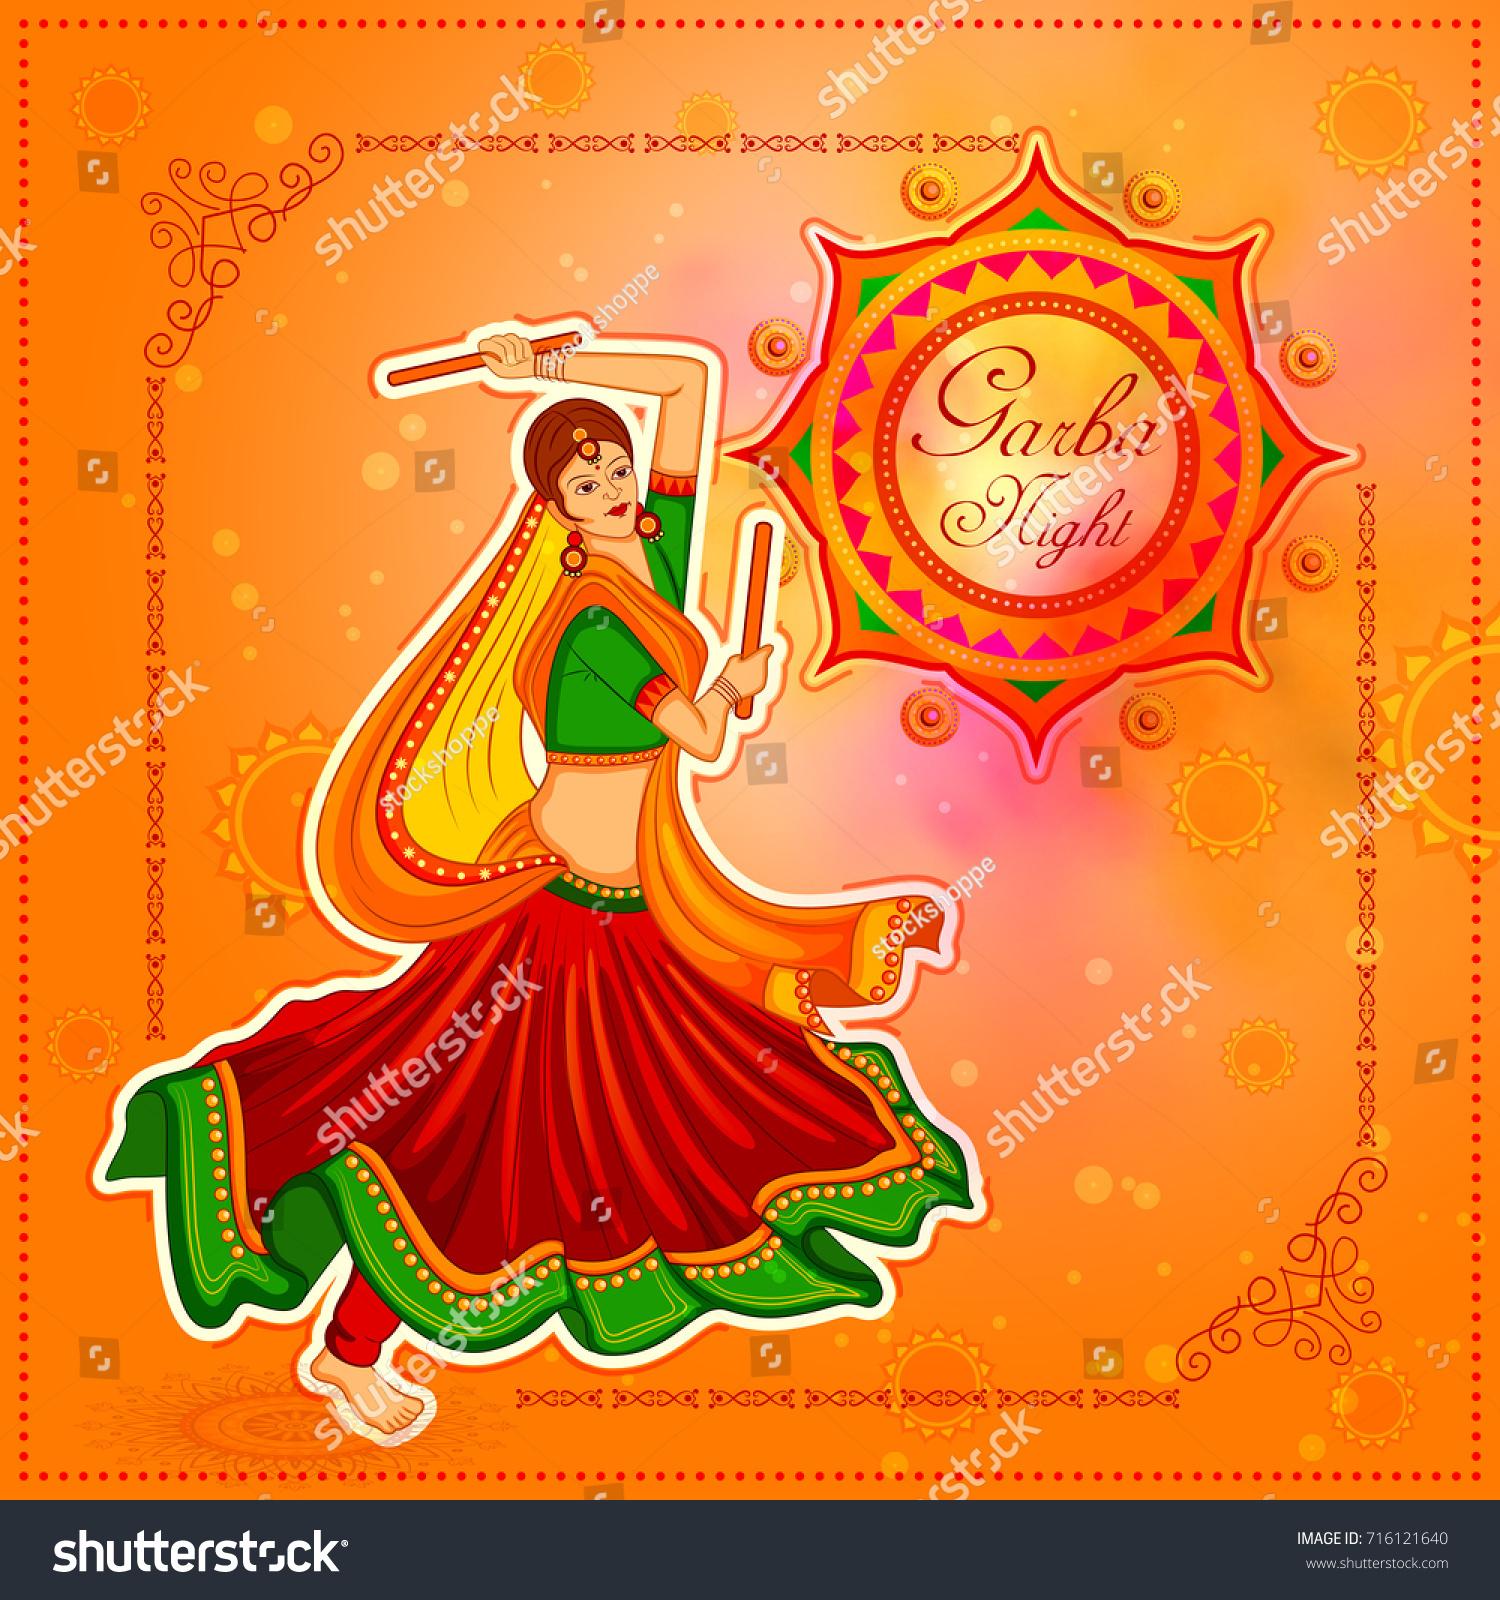 Vector Illustration People Performing Garba Dance Stock Vector Royalty Free 716121640